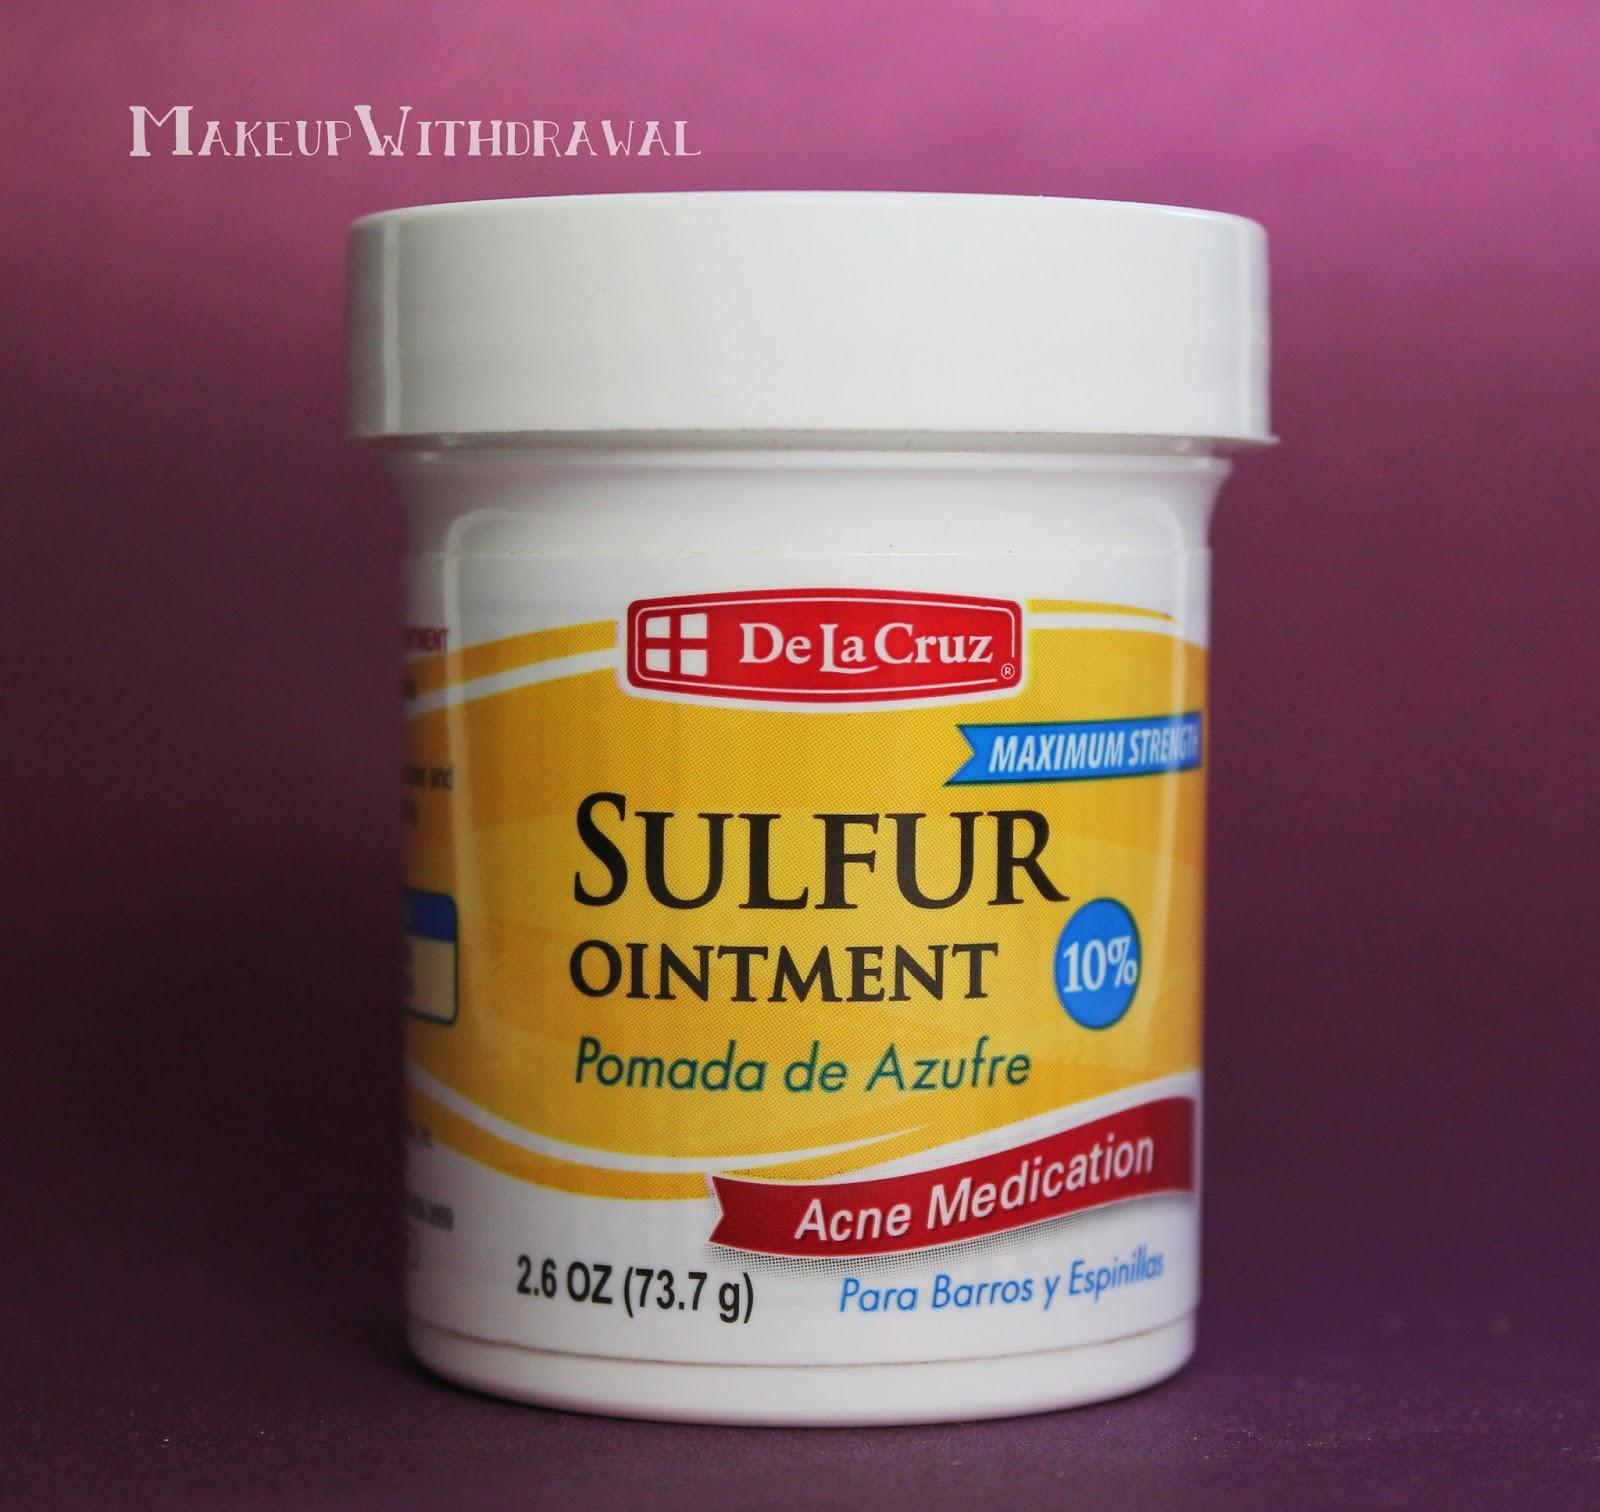 My Miracle Zit Zapper: De La Cruz Sulfur Ointment | Makeup Withdrawal